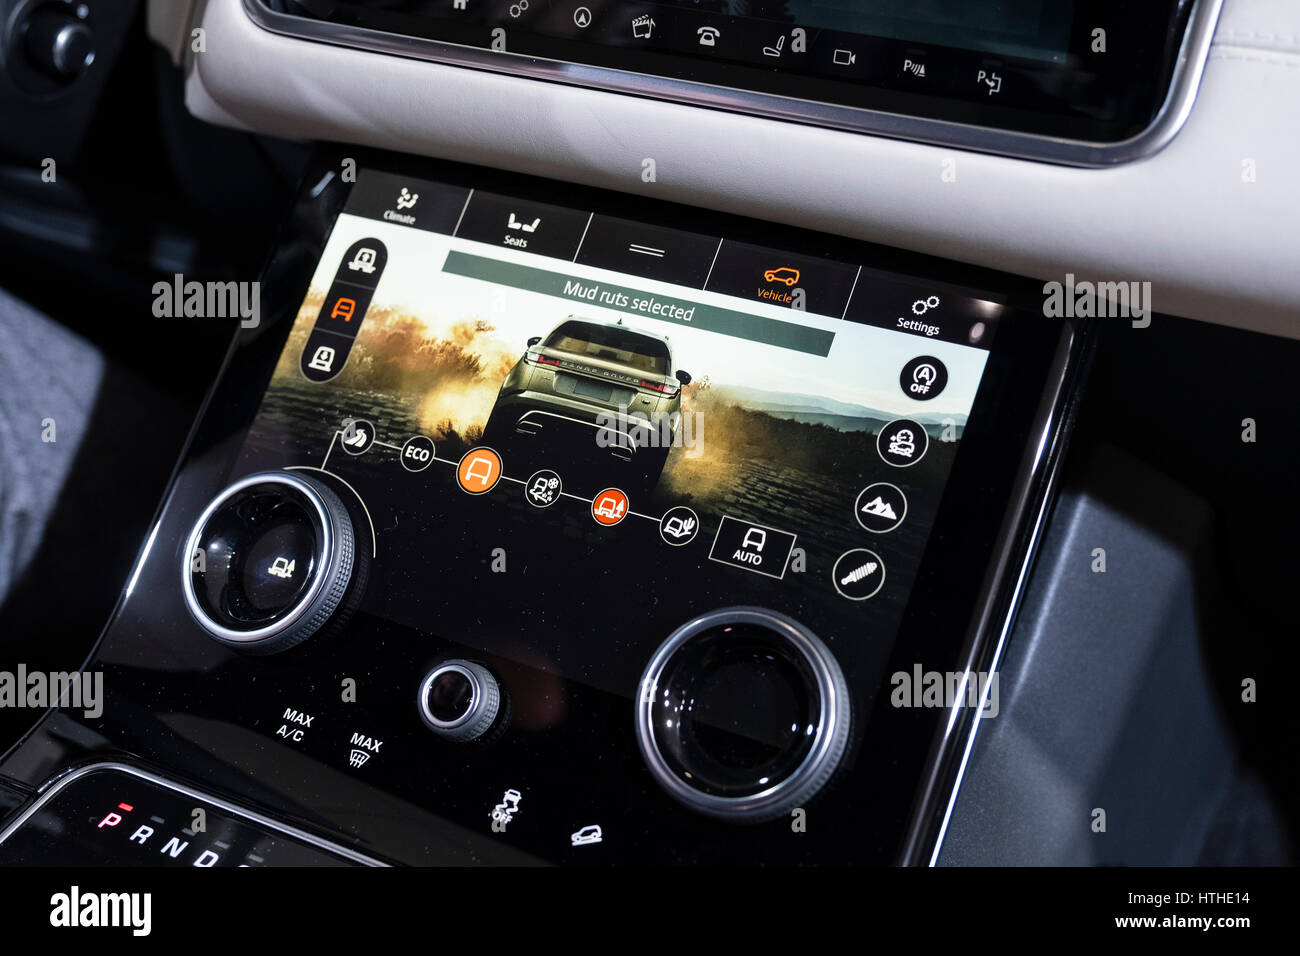 custom gear landrover dash styling indicator motorworks zulu rover land dashboard je defender interior